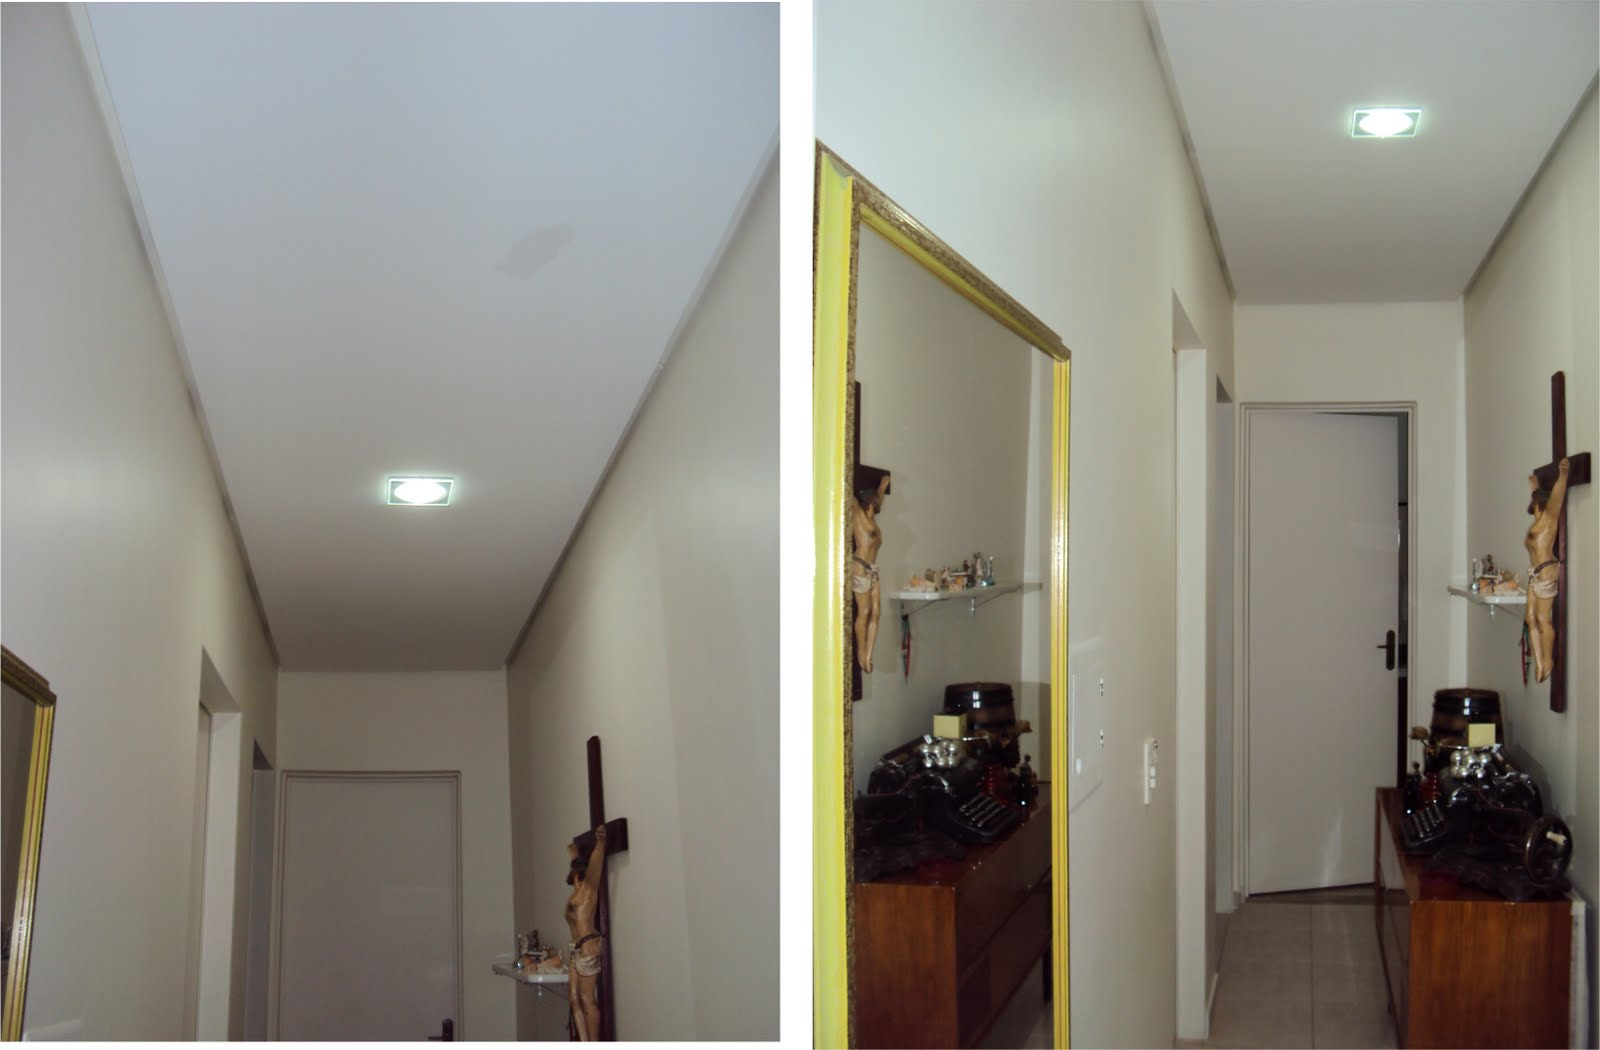 Marcia Schmidt: Reforma casa Inêz Schmidt Corredor x banheiro #34231E 1600 1050